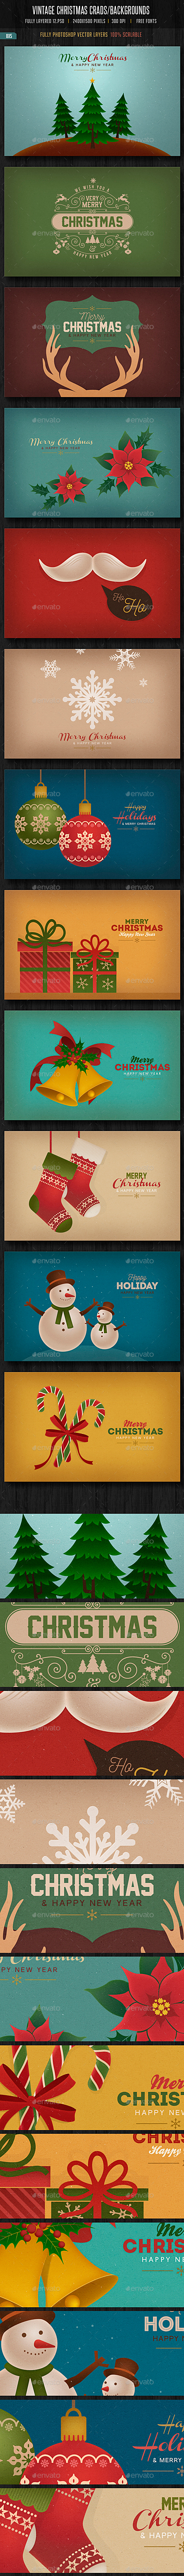 Vintage Christmas Cards/ Backgrounds